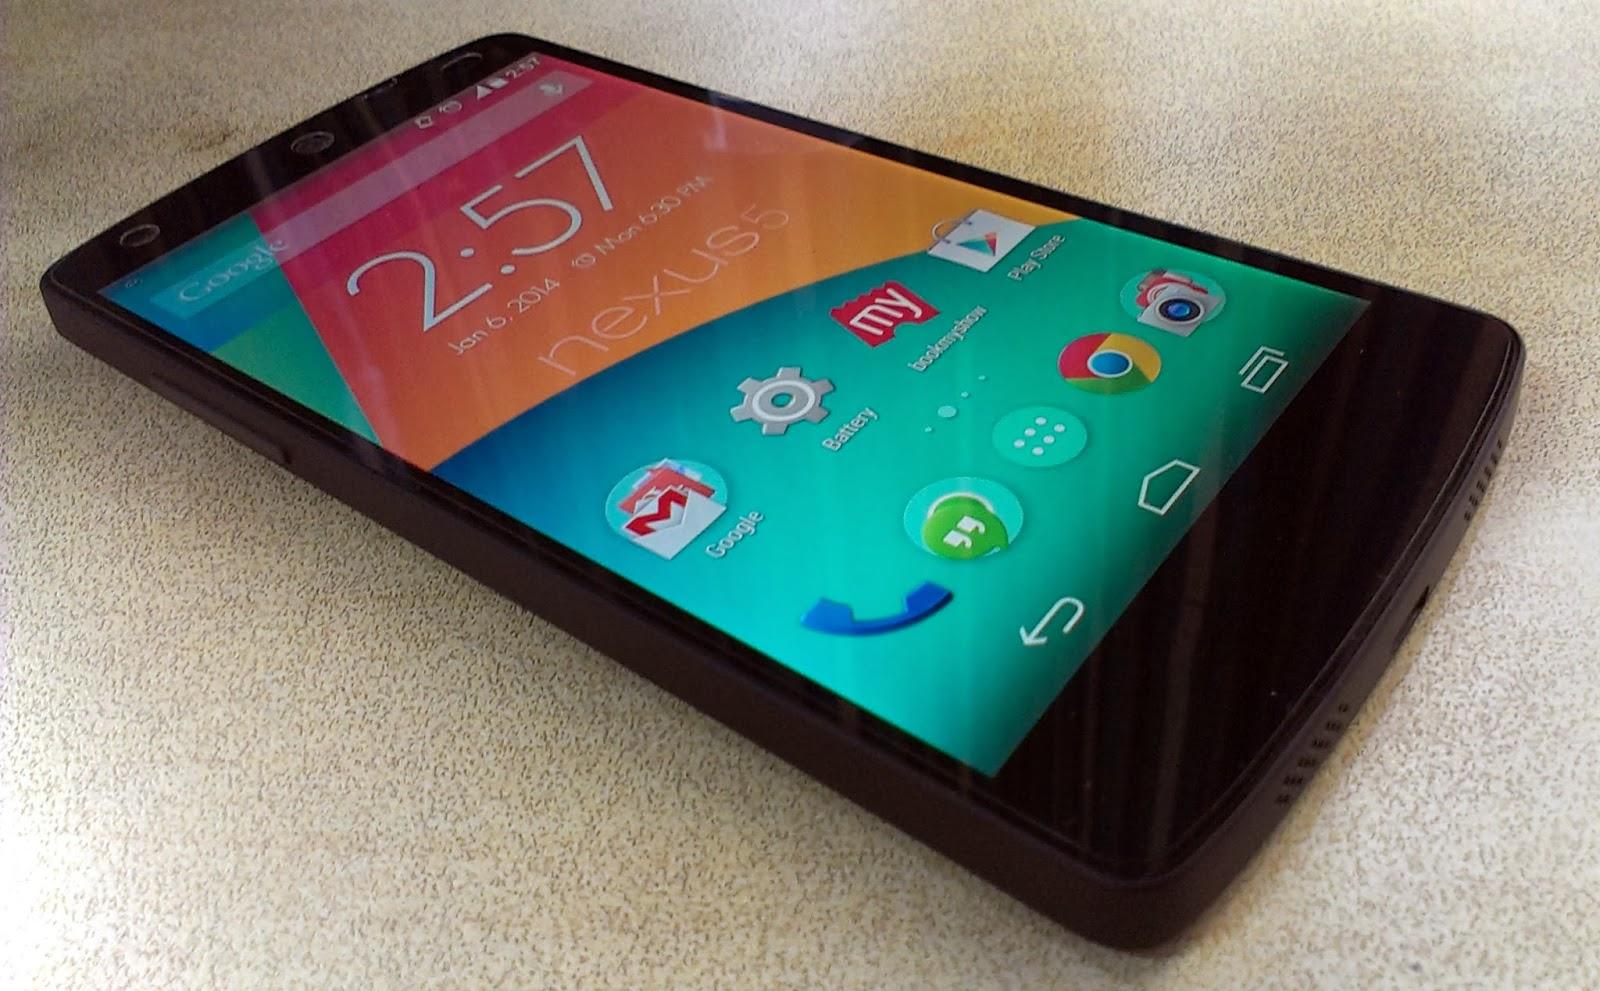 Google+LG+Nexus+5+Android+KitKat+Review+Handson+Detailed+Benchmark++%25283%2529.jpg